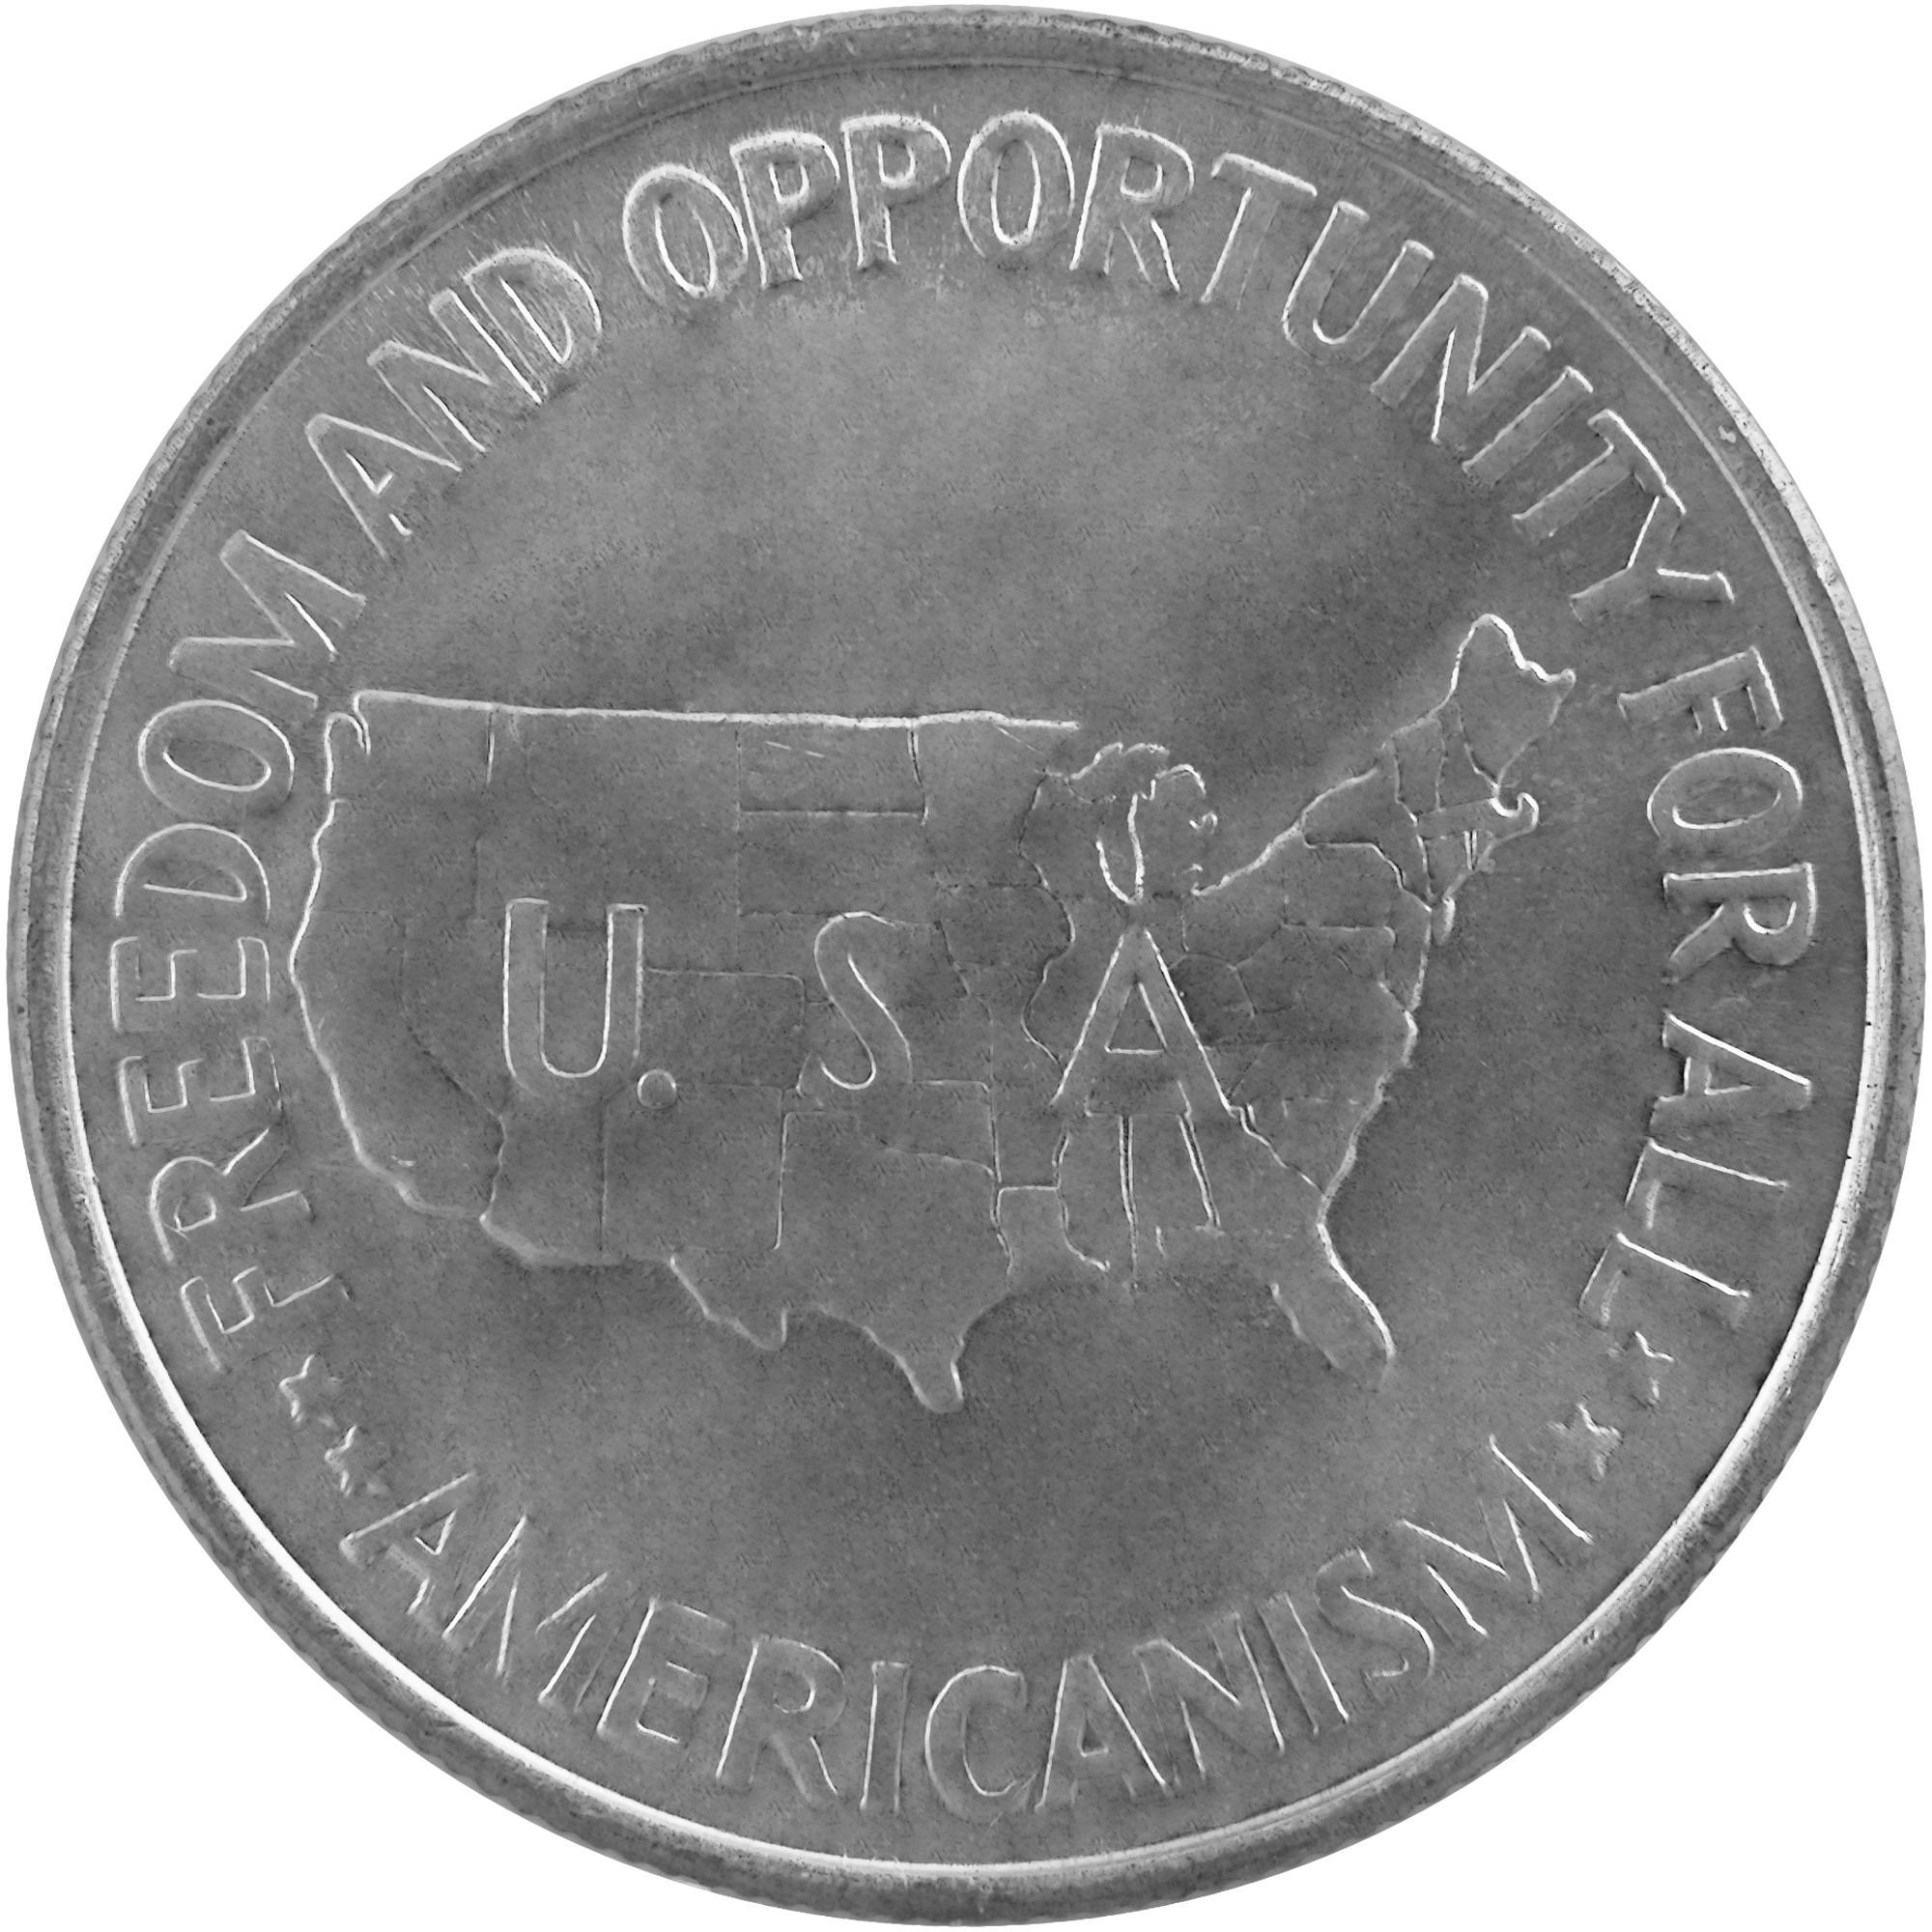 1952 George W. Carver Booker T. Washington Commemorative Silver Half Dollar Coin Reverse